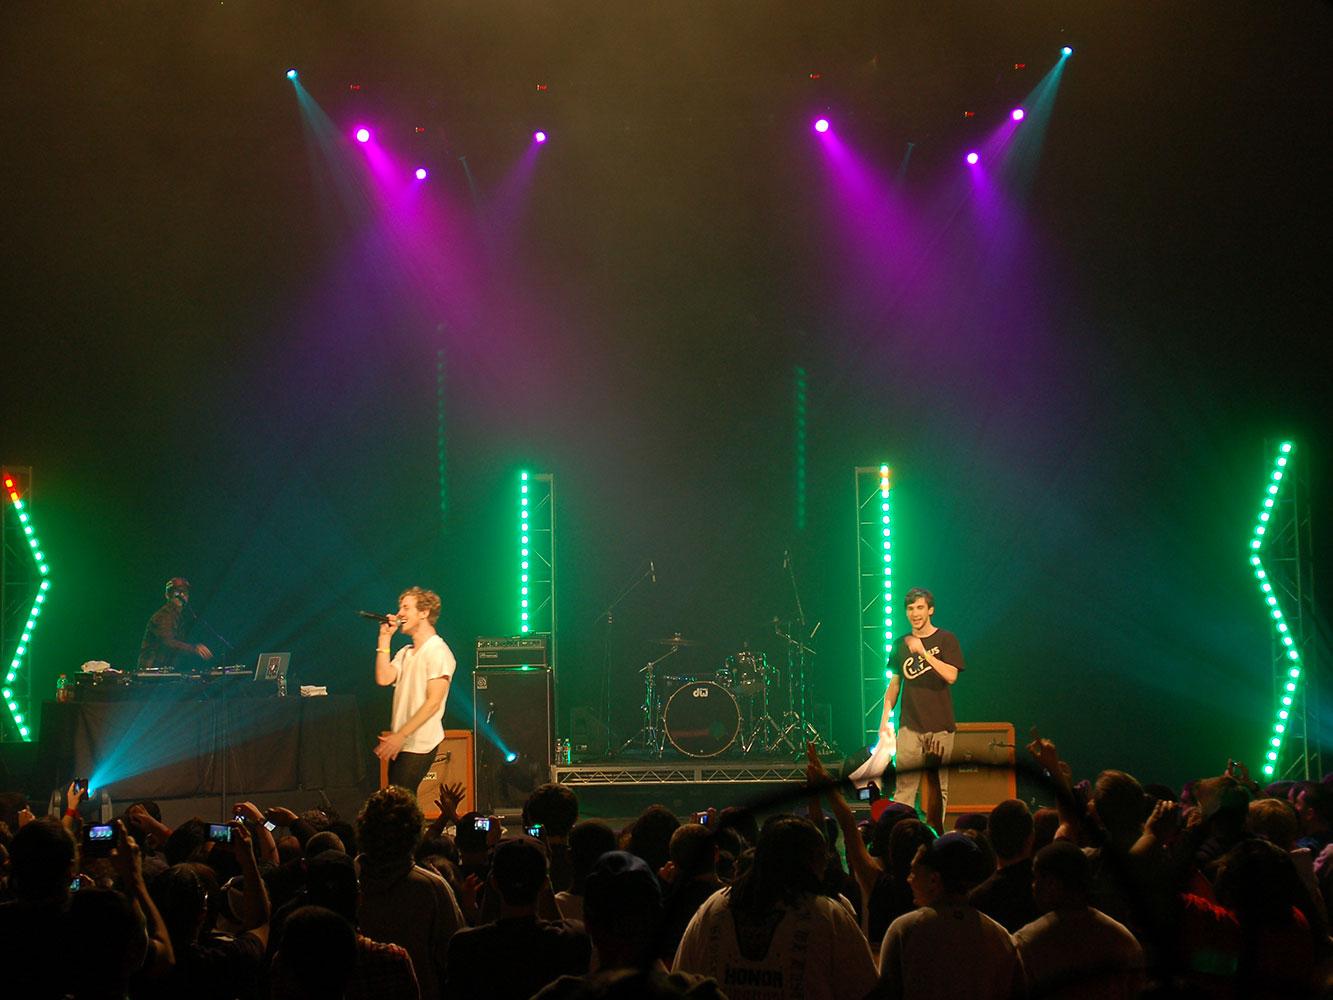 Nike-Grammy-Concert---Simple-Concert-Lighting